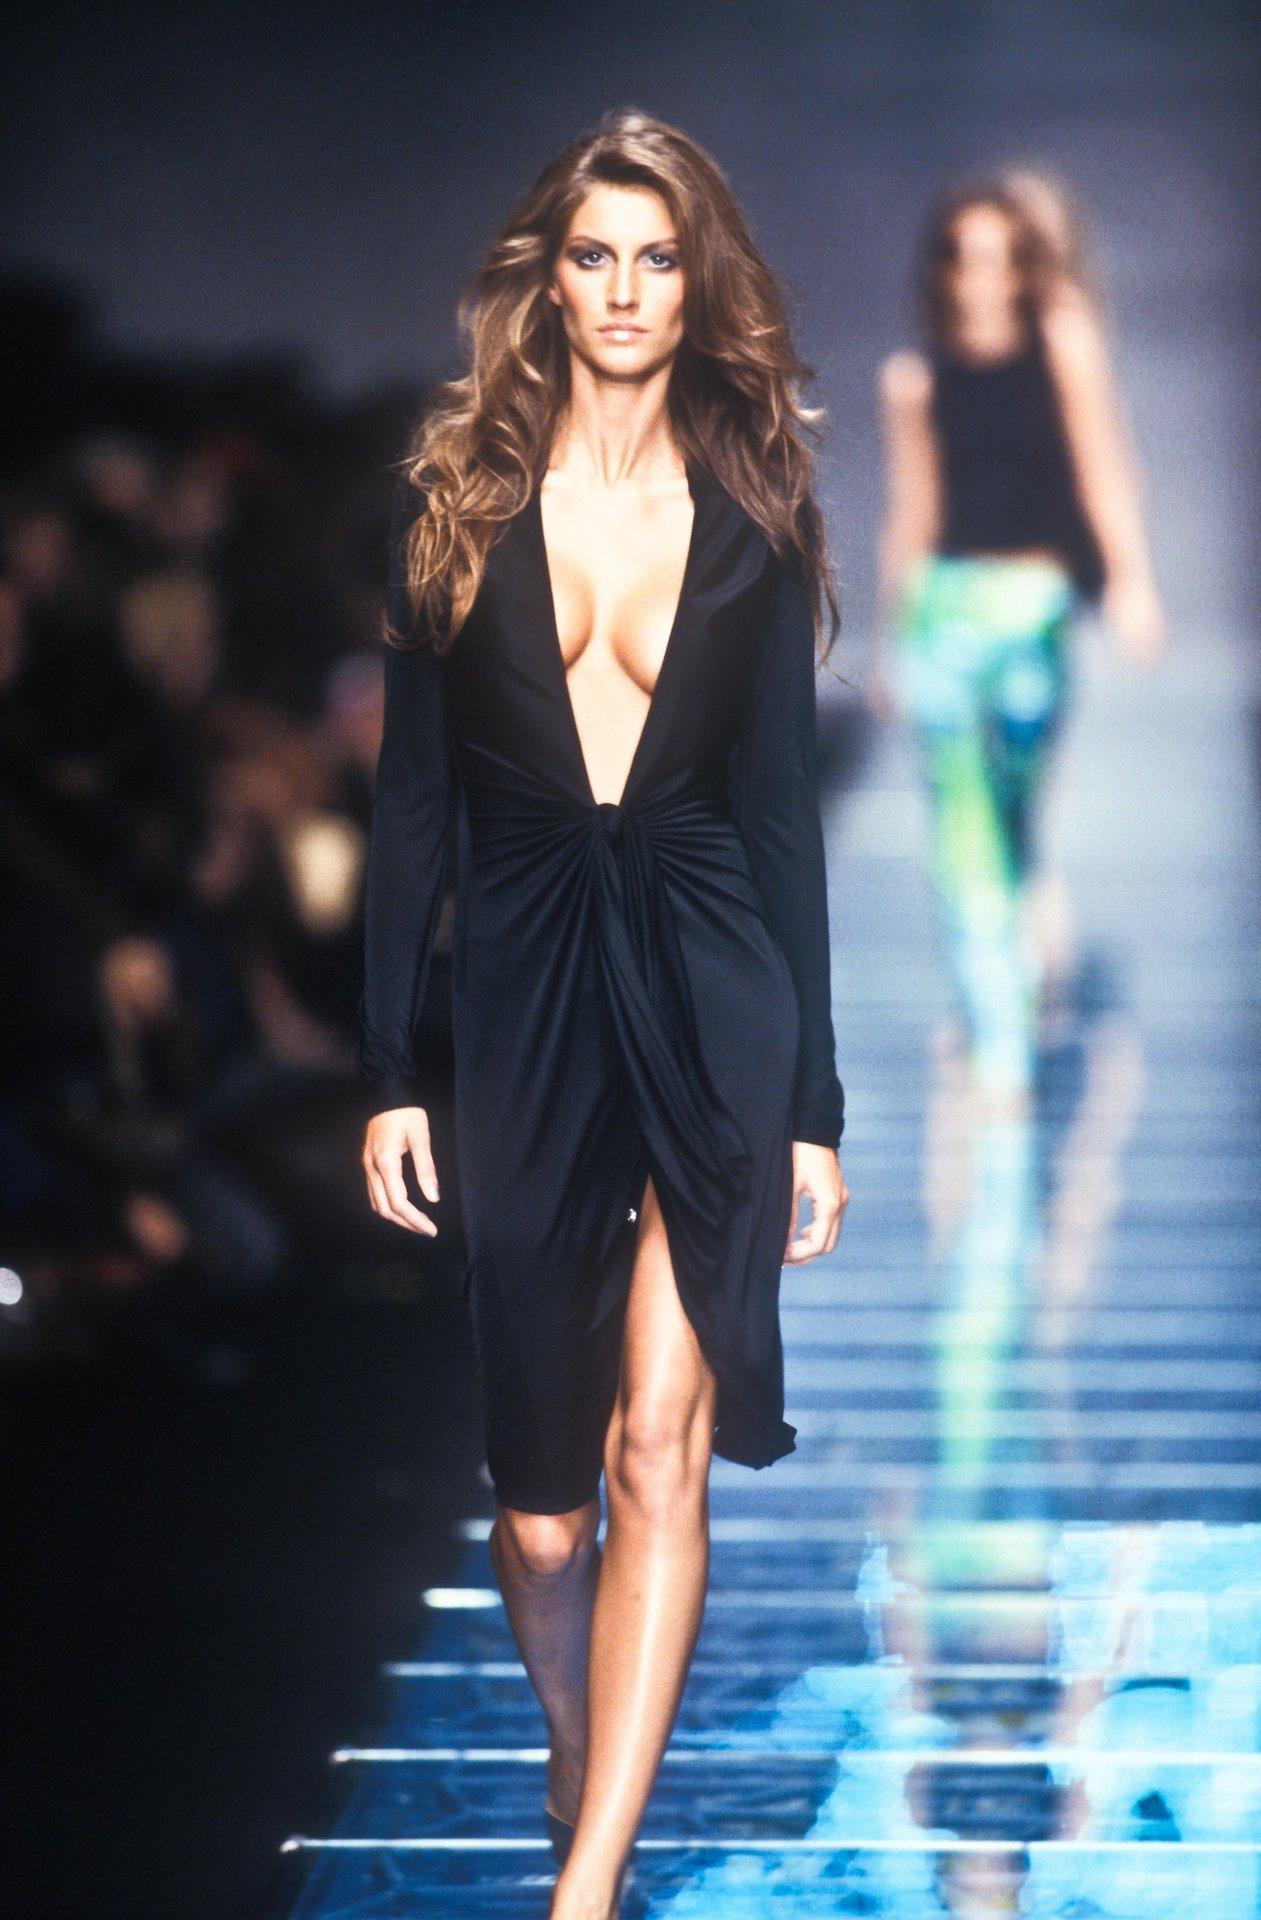 Ana Maria Polvorosa Hot lelaid: gisele bundchen at versace s/s 2000 – supermodels